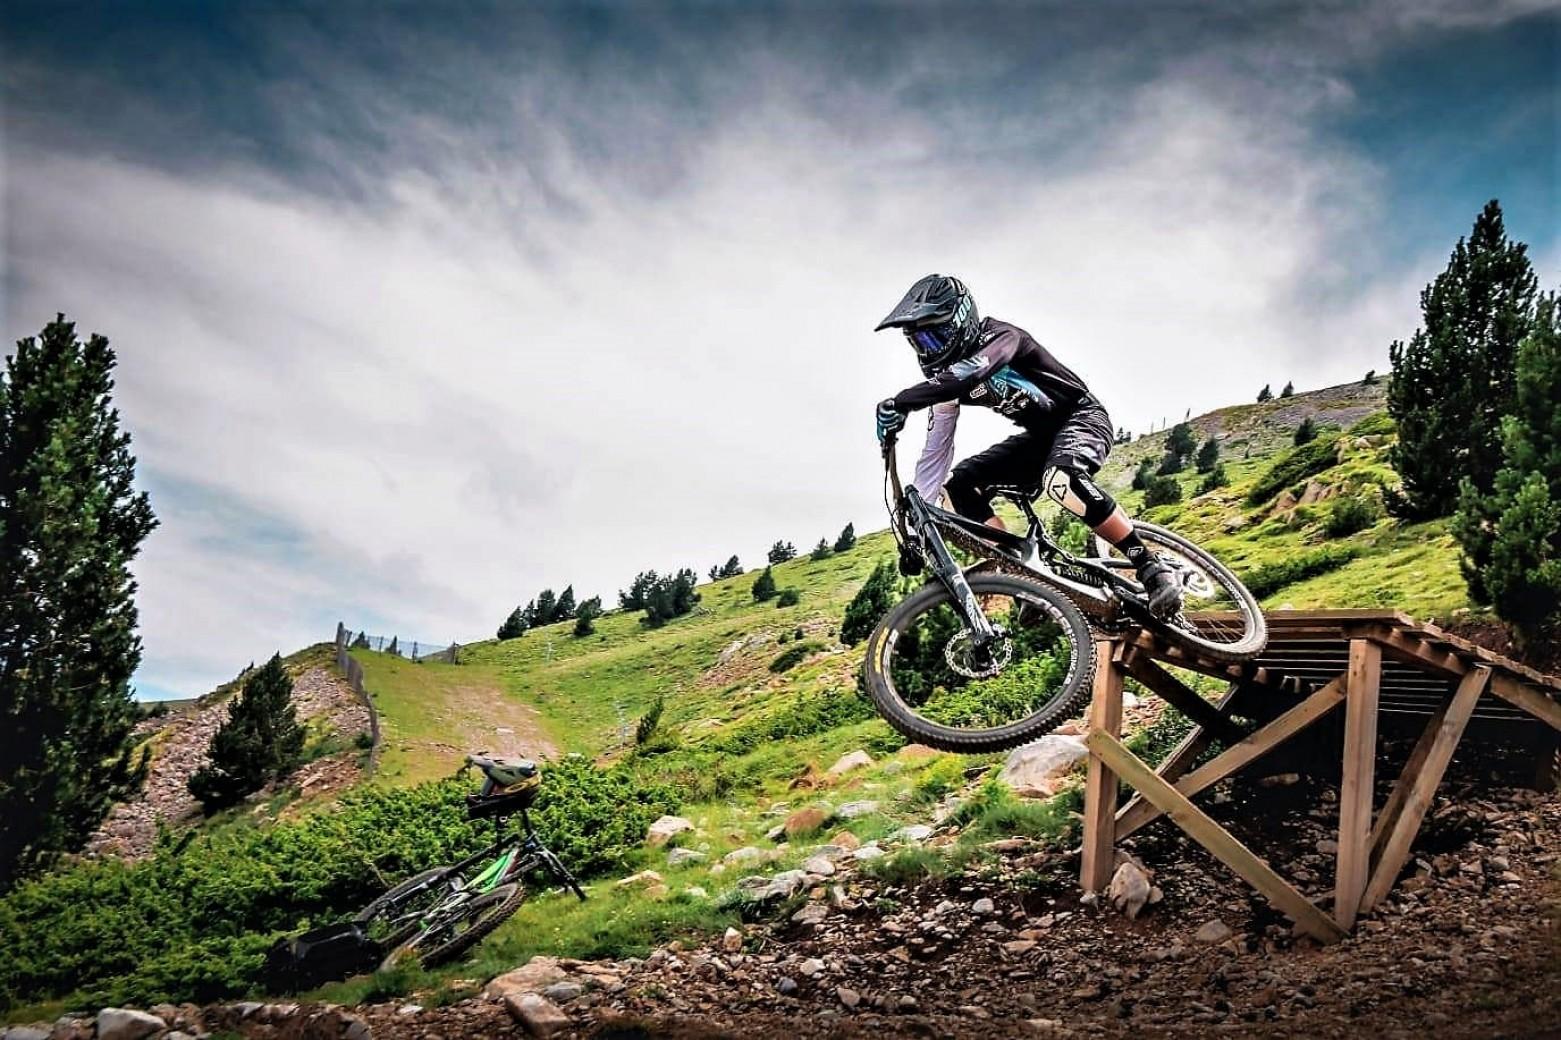 bike-park-girona-2022/